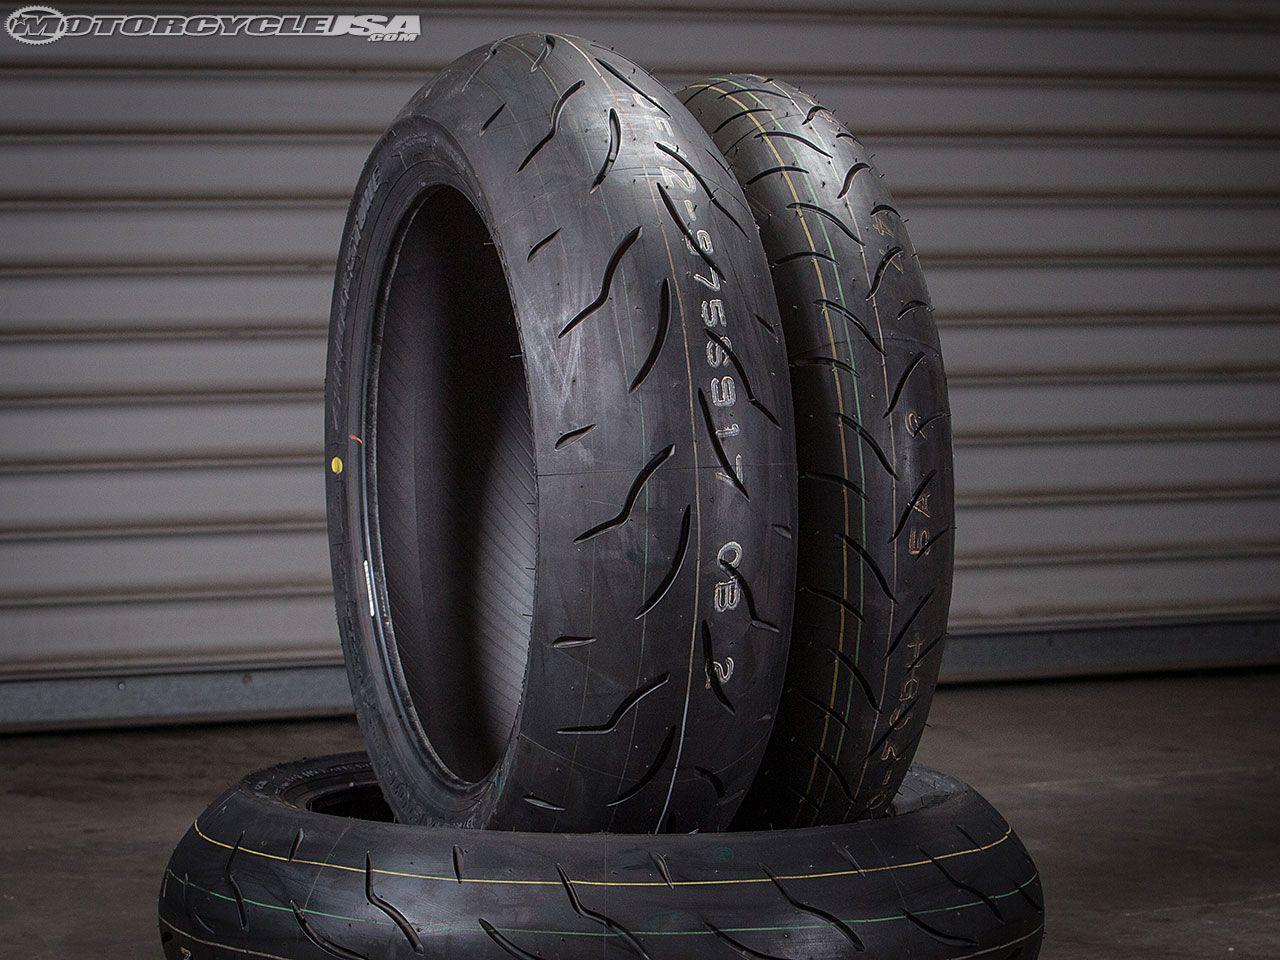 Bridgestone Battlax BT-016 Tire Comparison Review